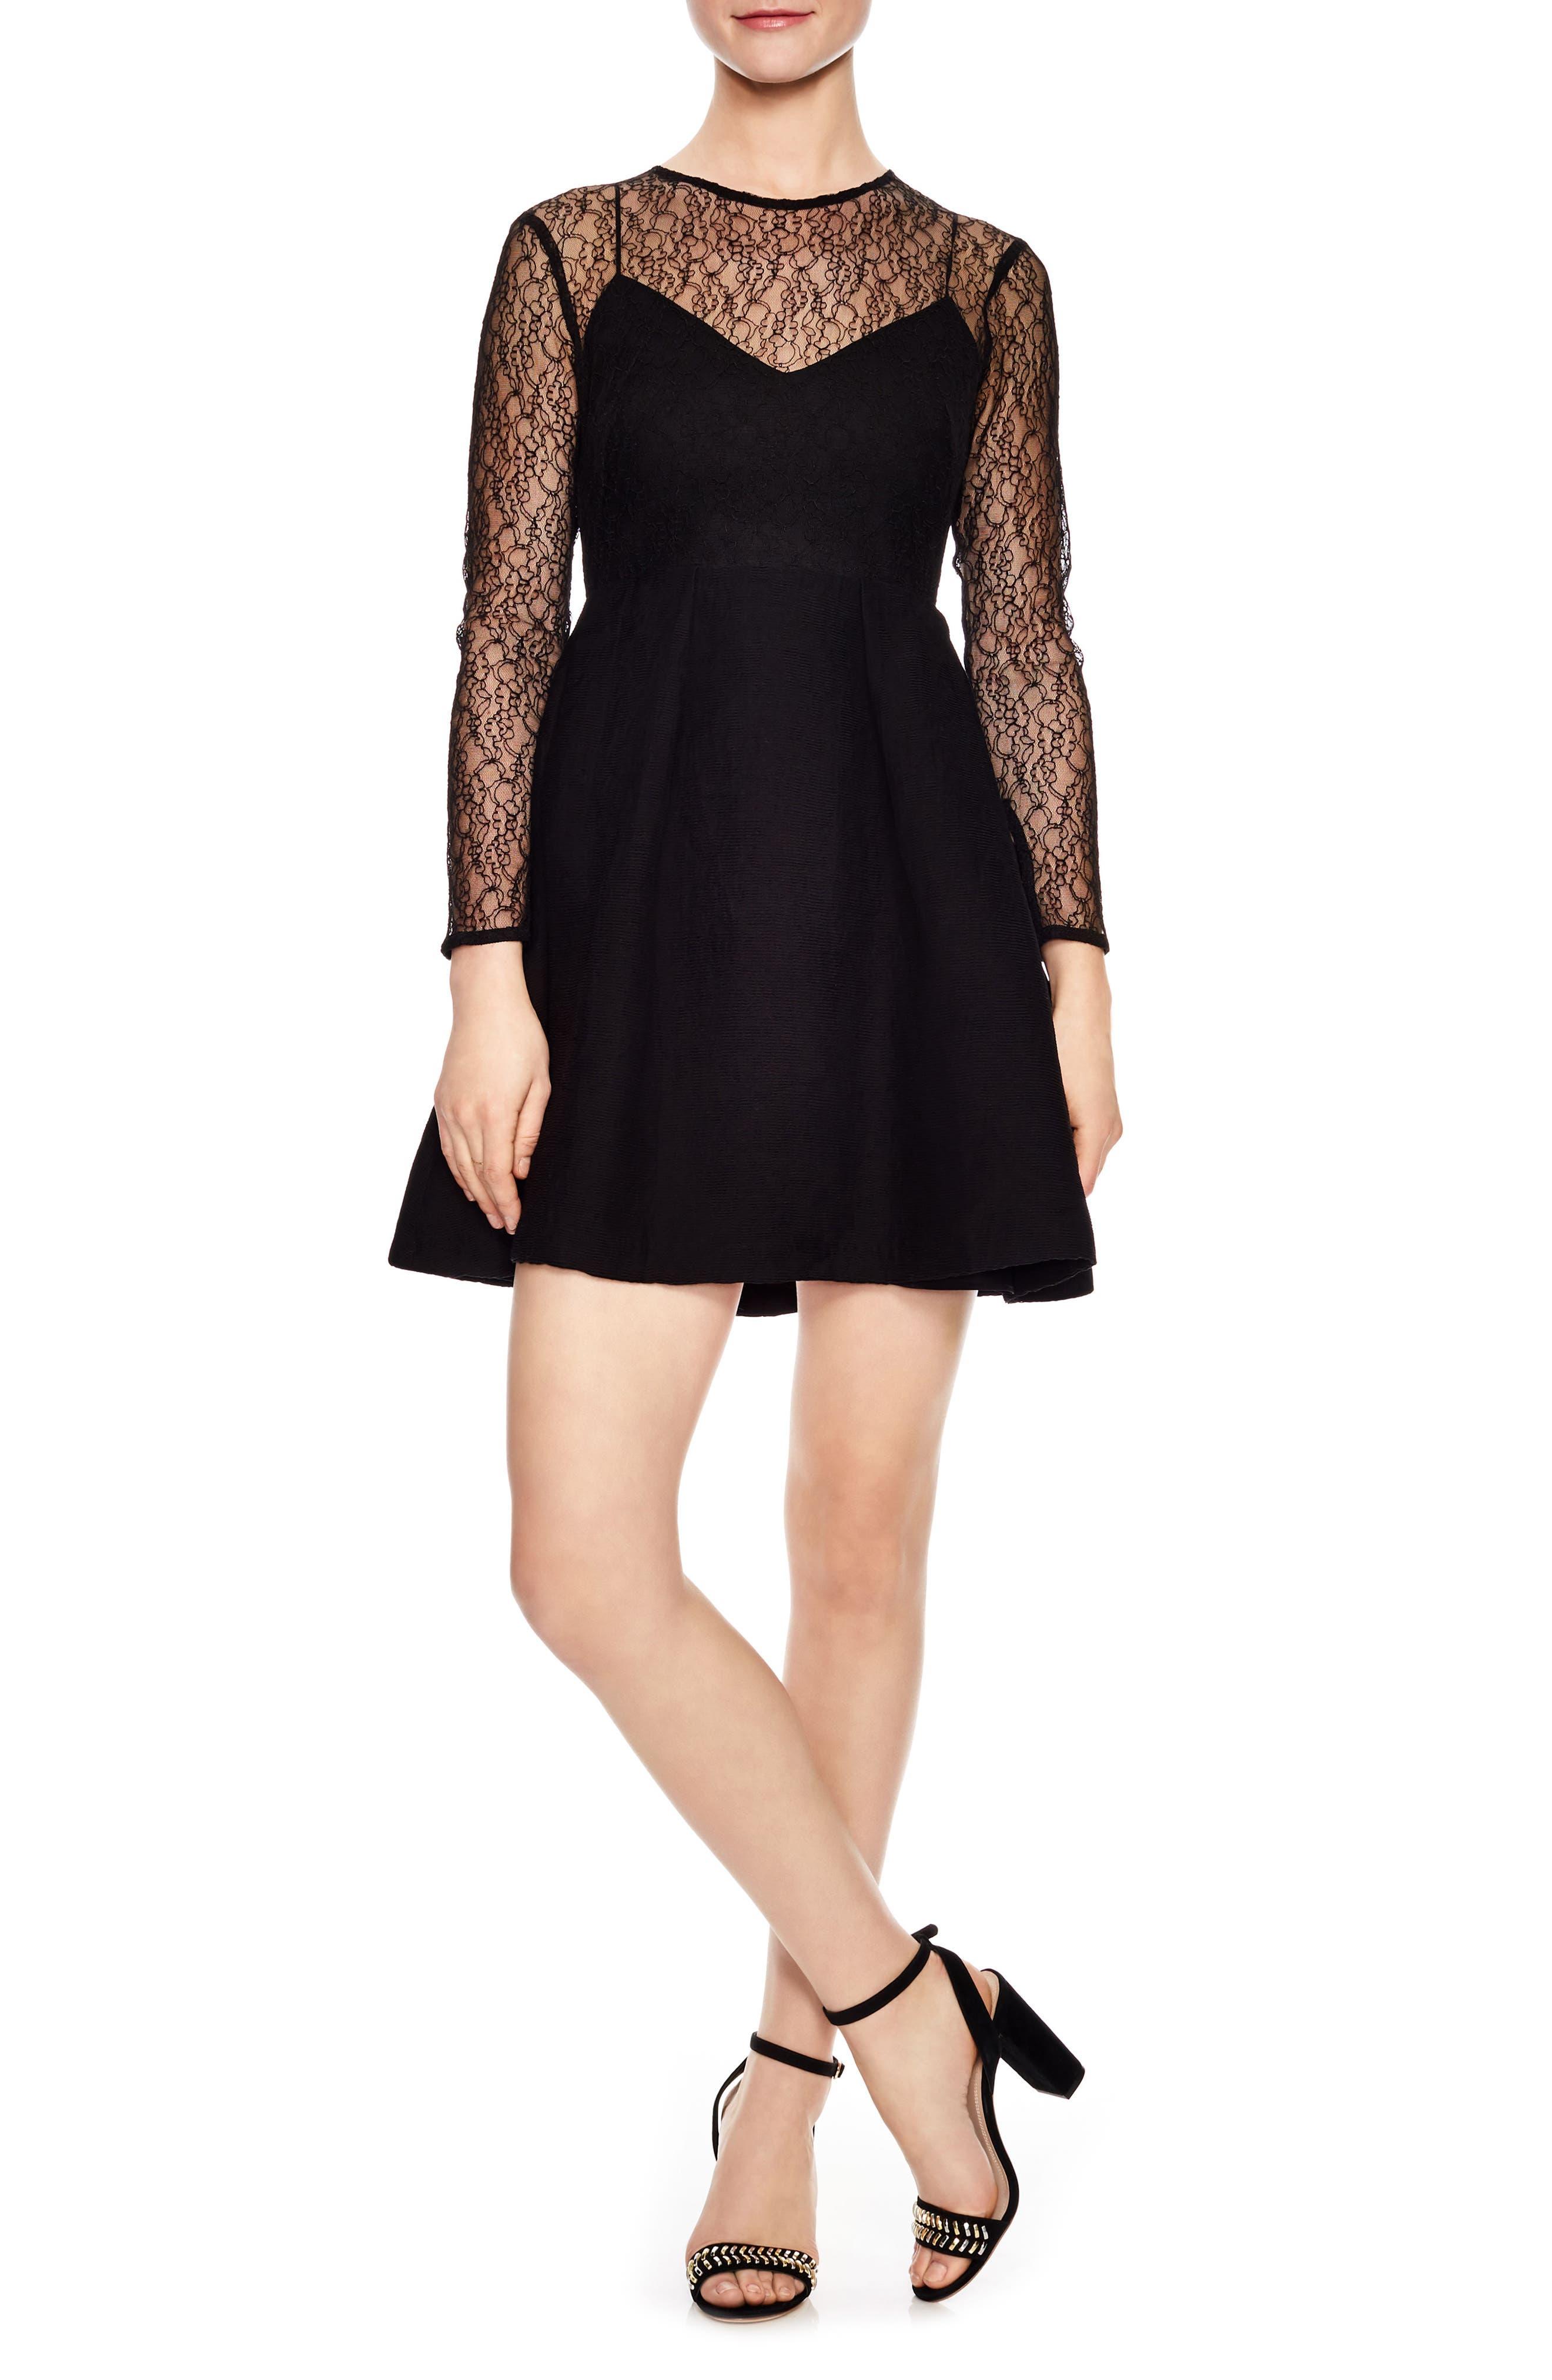 Noir Illusion Lace Mini Dress,                             Main thumbnail 1, color,                             Black